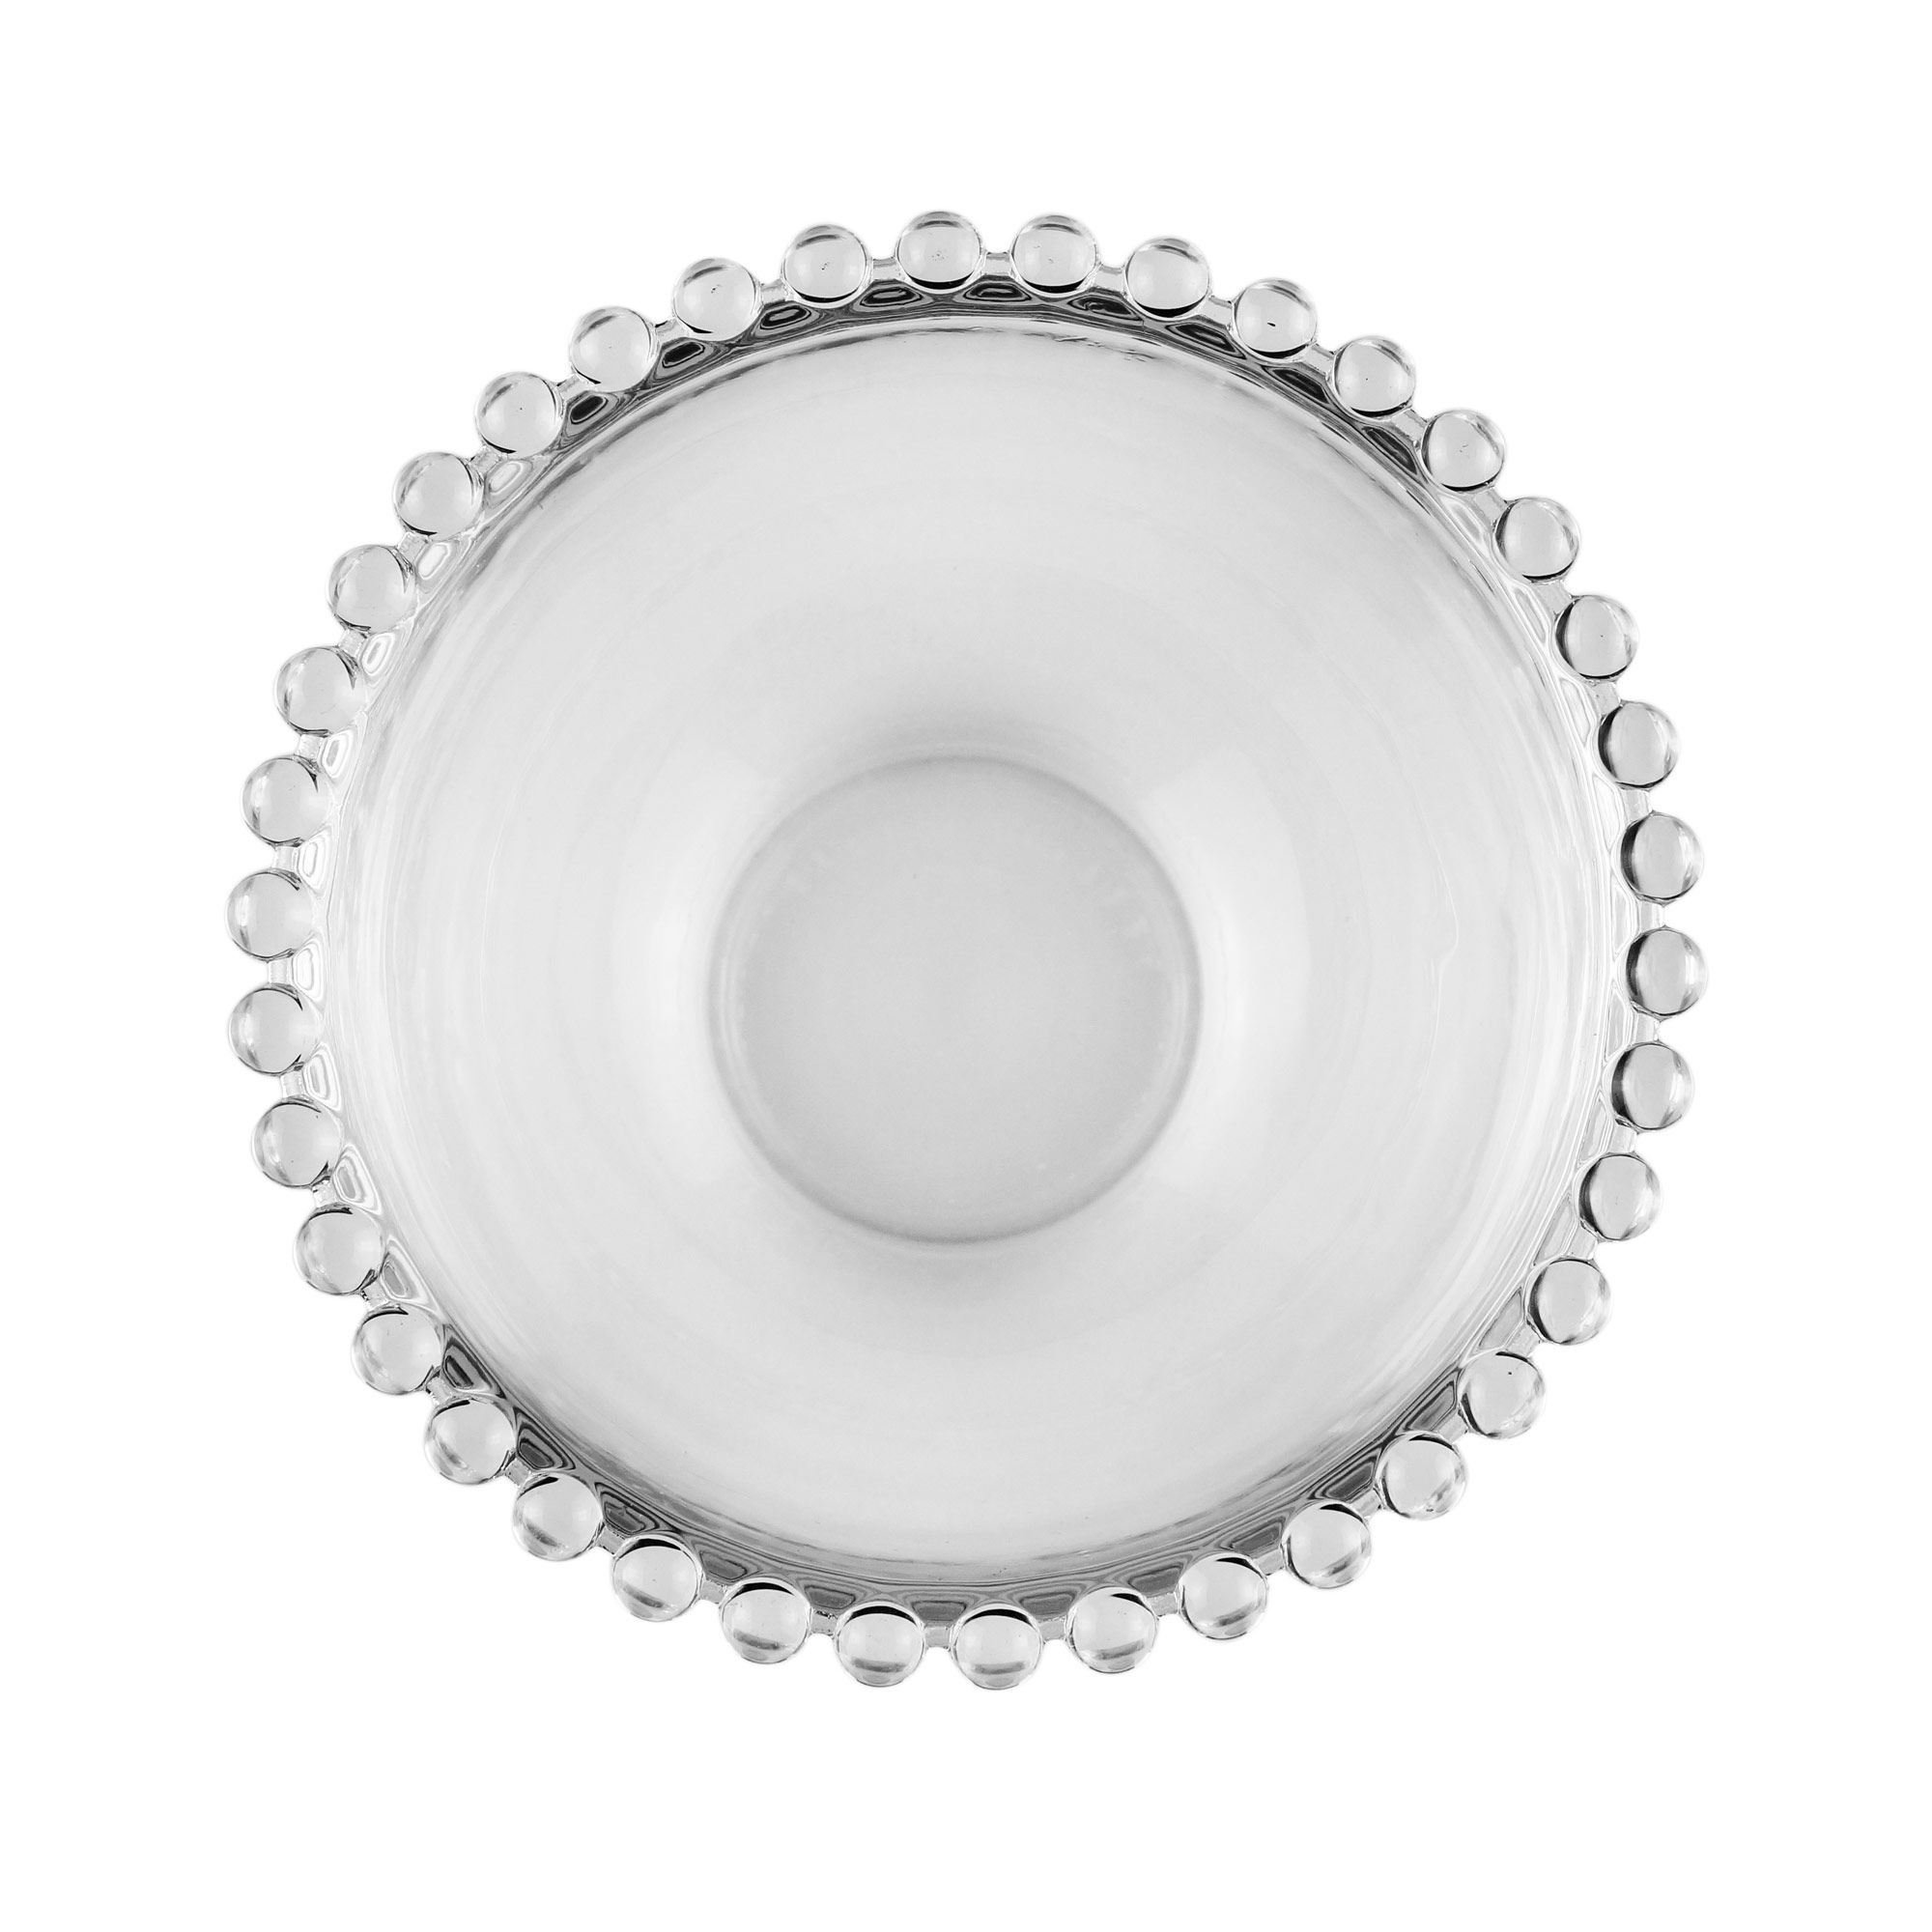 Jogo 4 bowls 14 cm para sobremesa de cristal transparente Pearl Wolff - 27895